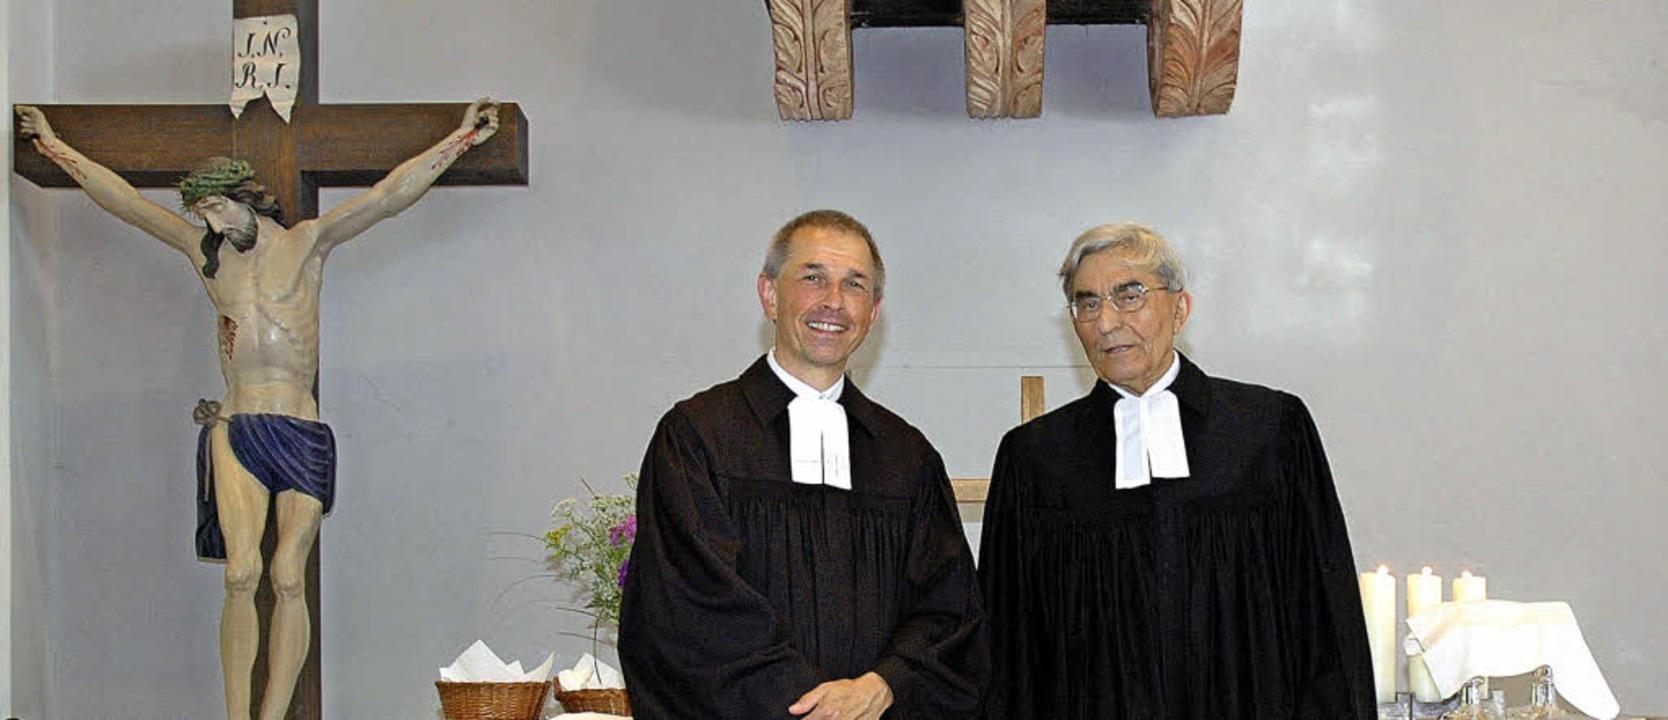 Pfarrer Matthias Weber (links im Bild)...h dem Pfingstgottesdienst in Kandern.   | Foto: Regine Ounas-Kräusel